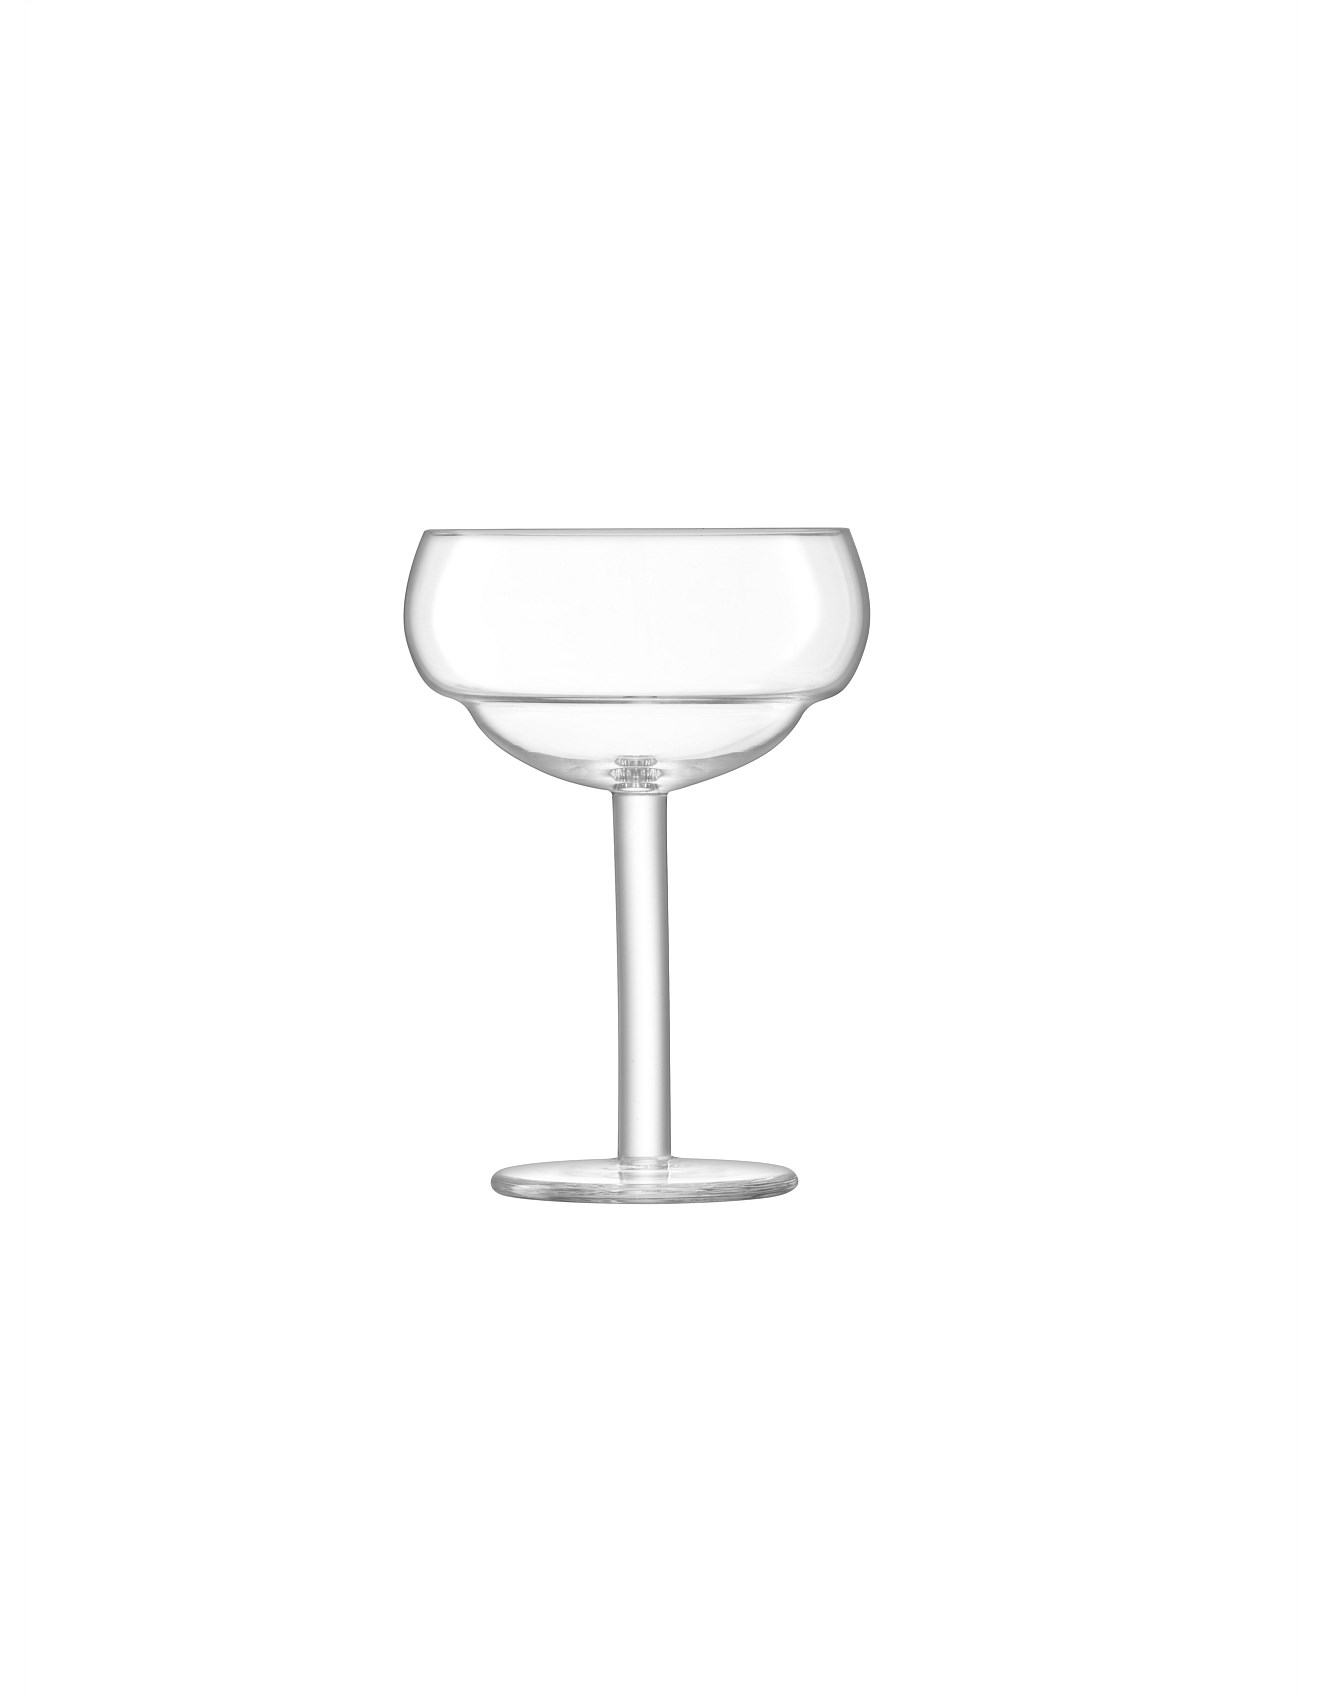 Barware Drinkware Drinking Glasses Online David Jones Mixologist Cocktail Coupe Glass Pair